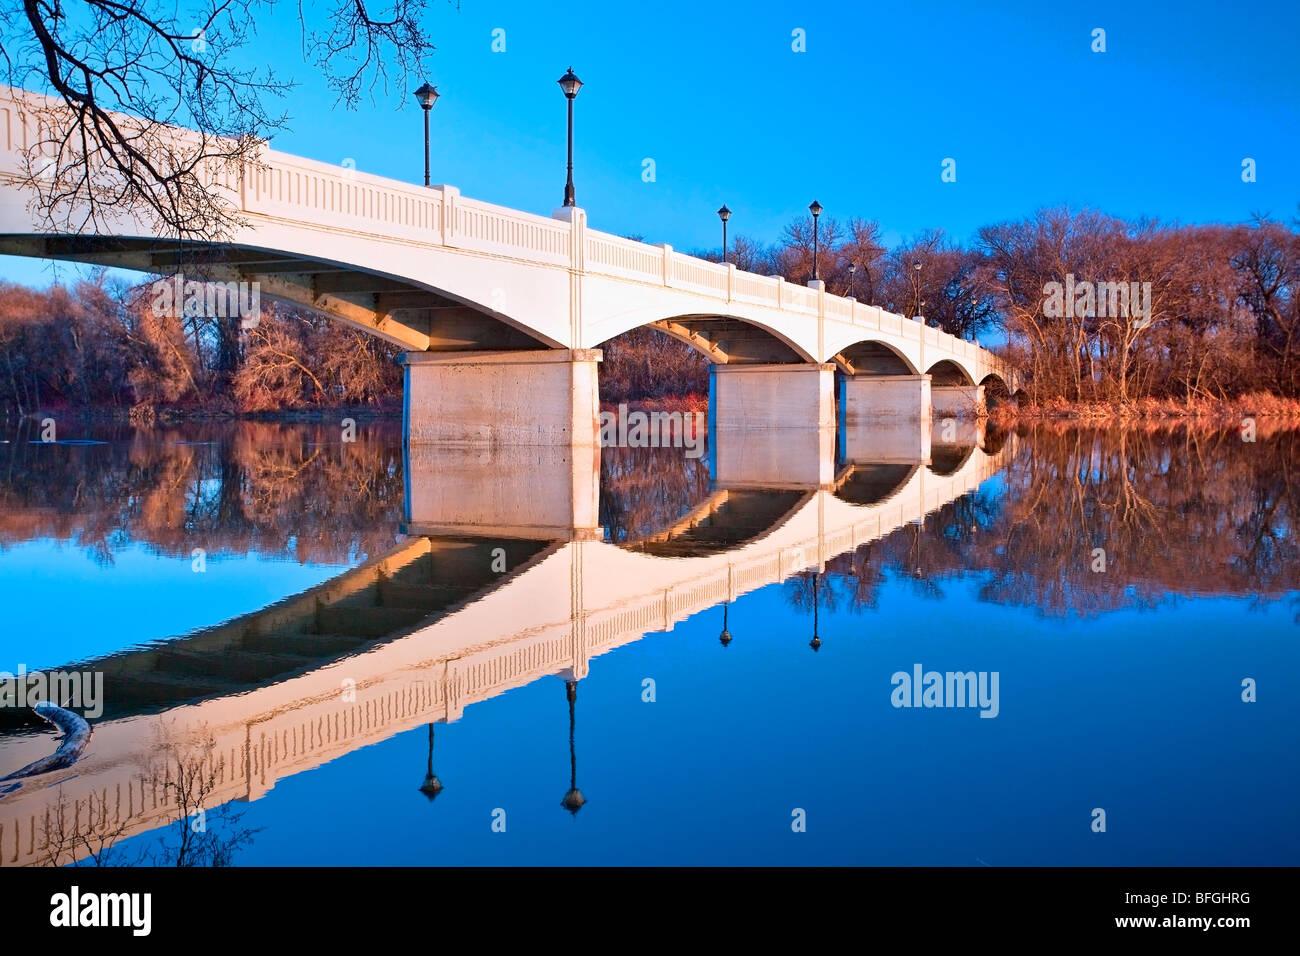 Assiniboine Park foot bridge crossing the Assiniboine River, Winnipeg, Manitoba, Canada - Stock Image